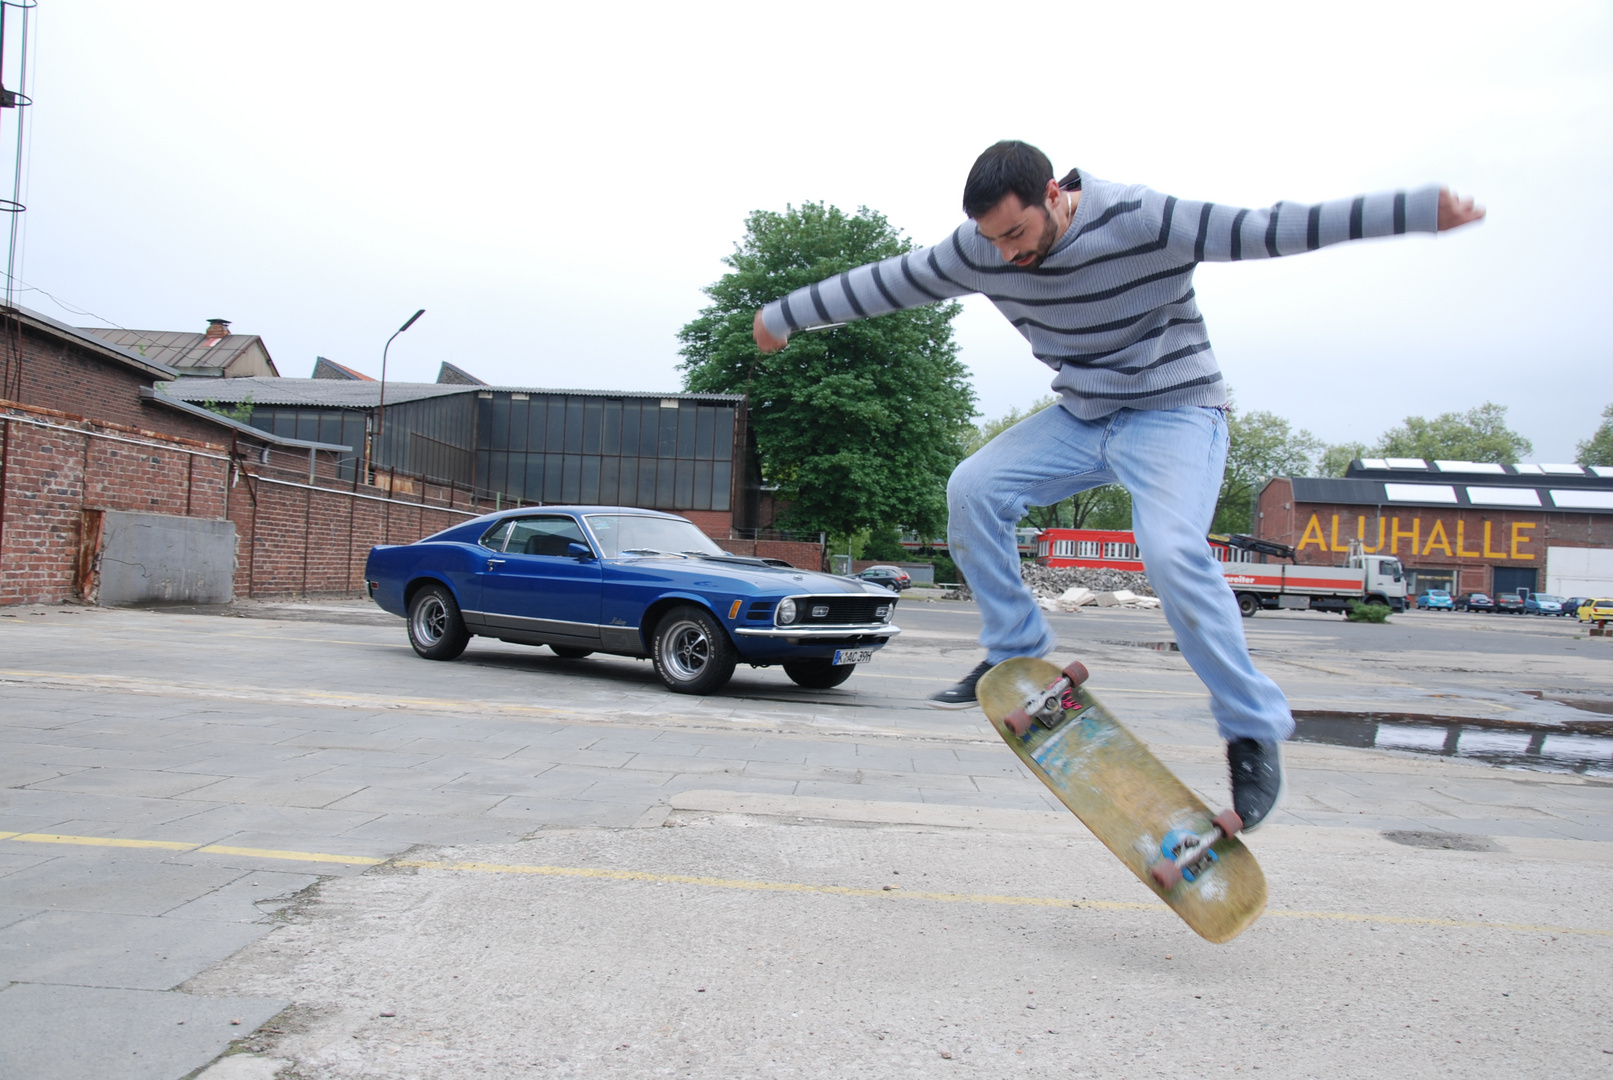 Skater am Mustang